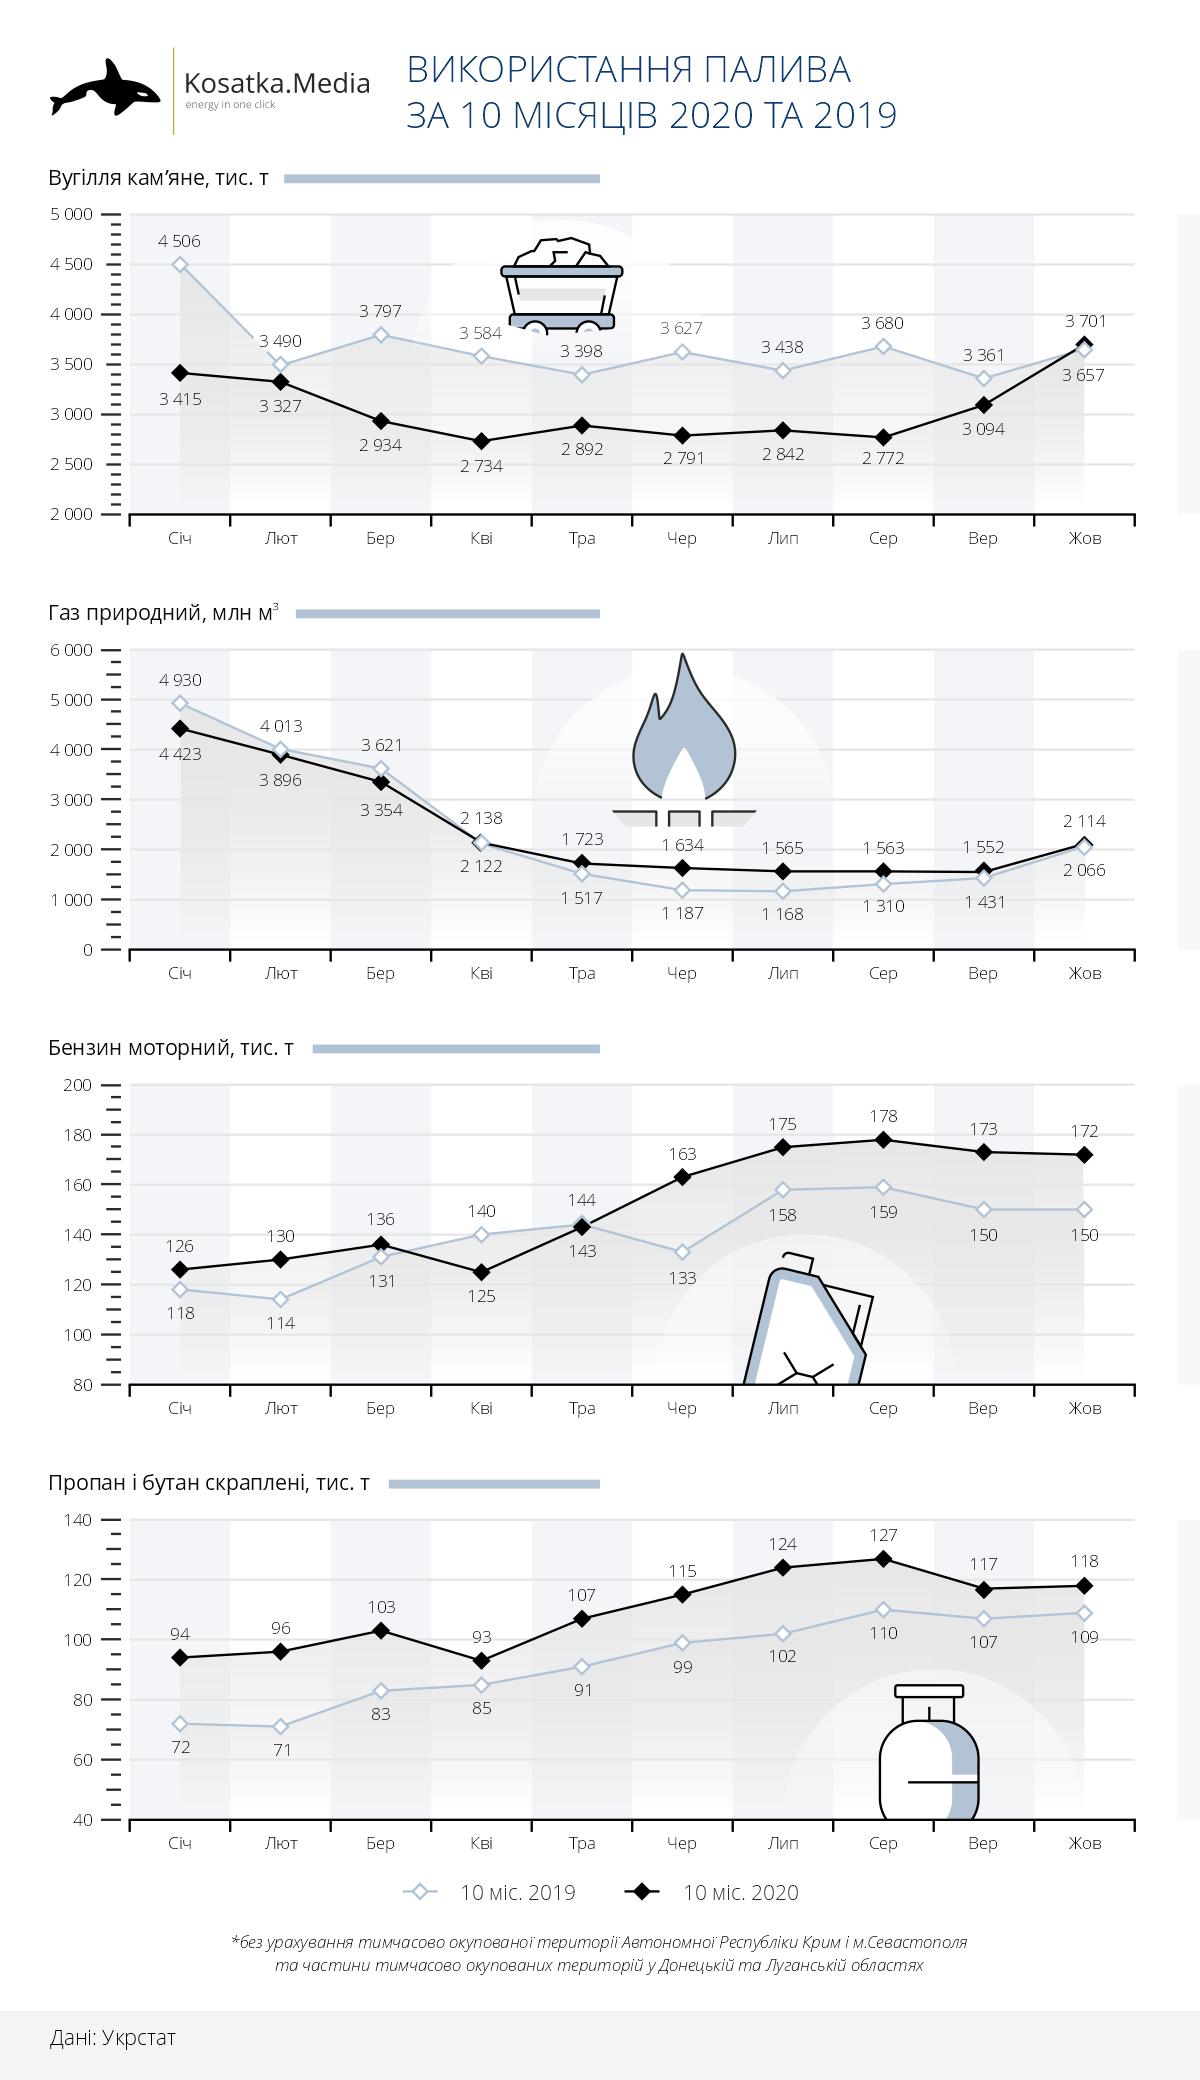 Україна зменшила споживання вугілля і збільшила бензину